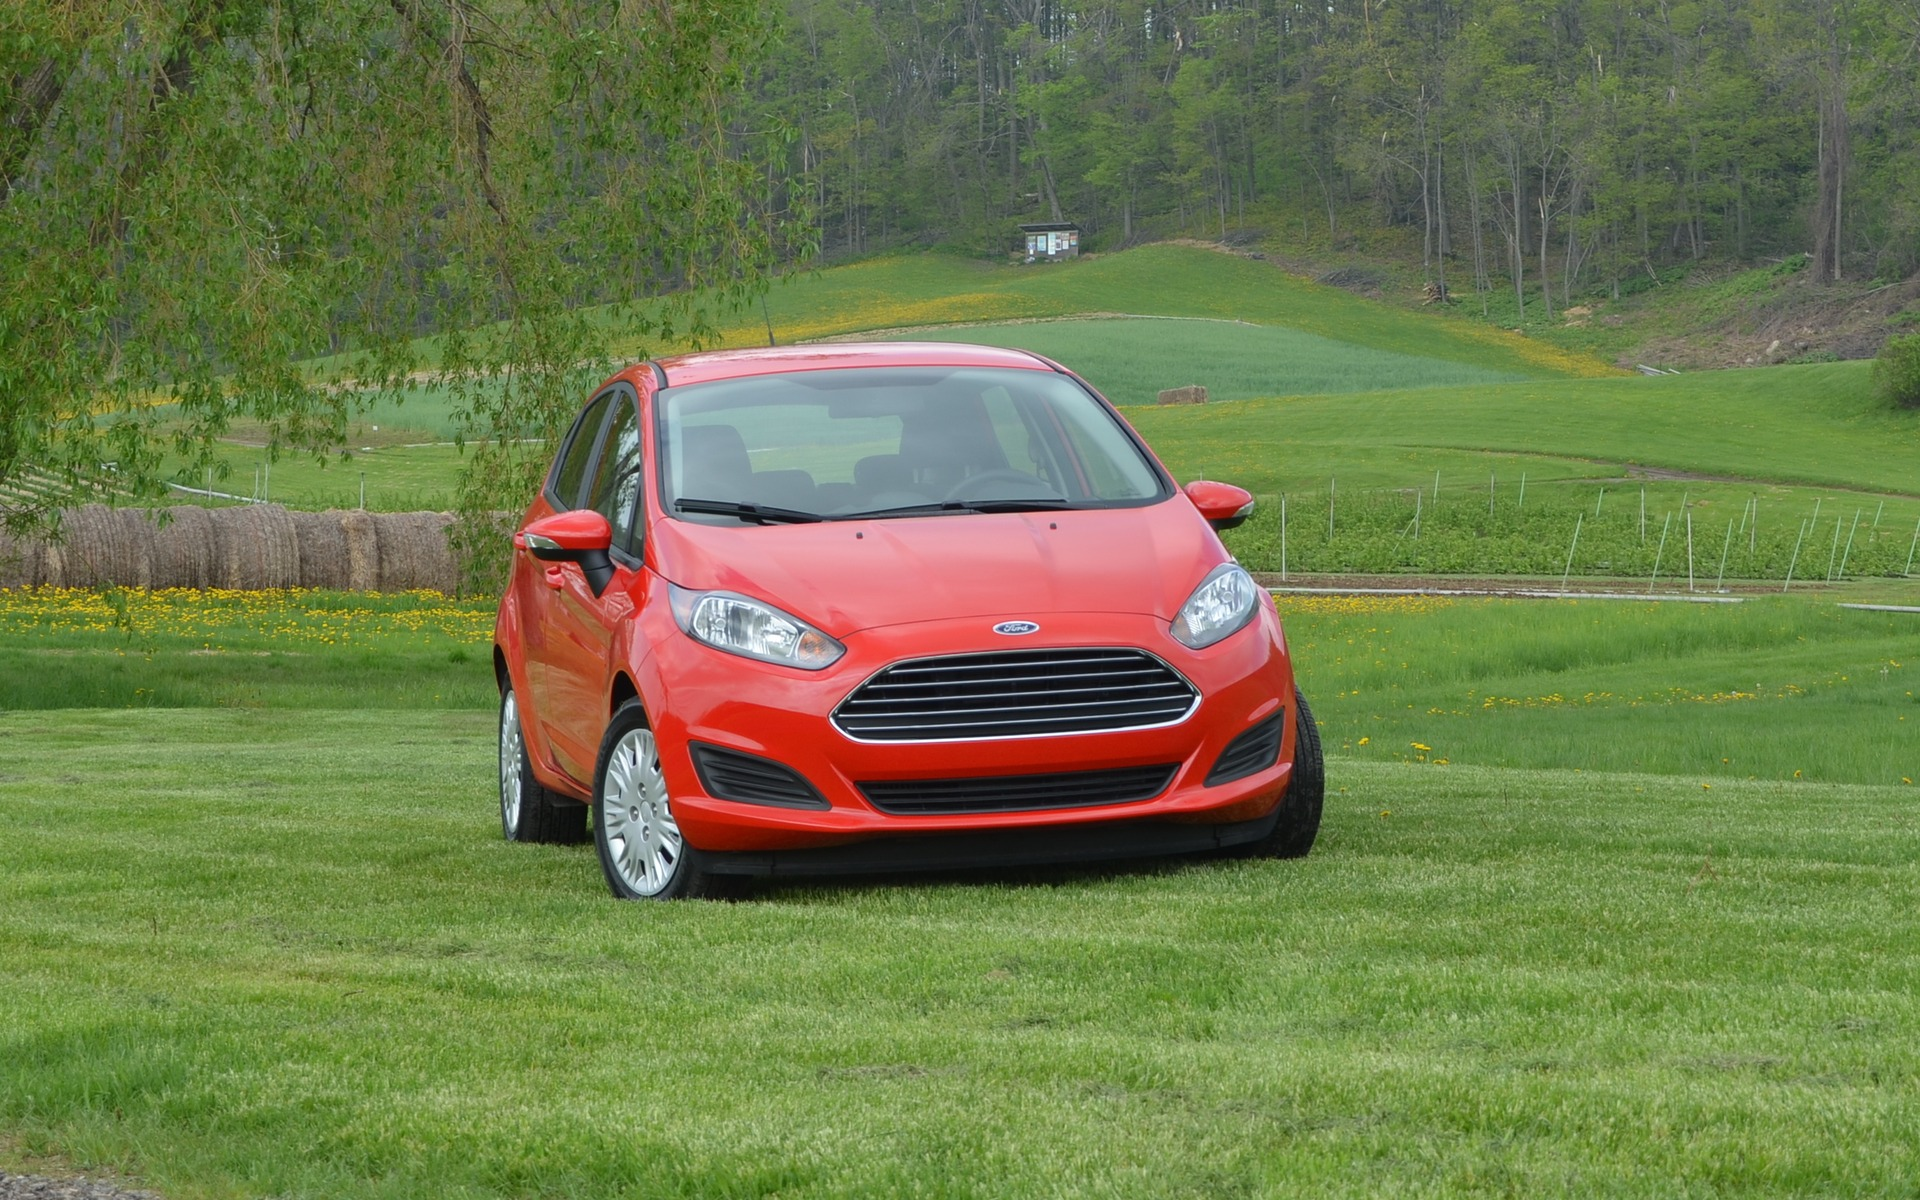 Ford Fiesta SFE